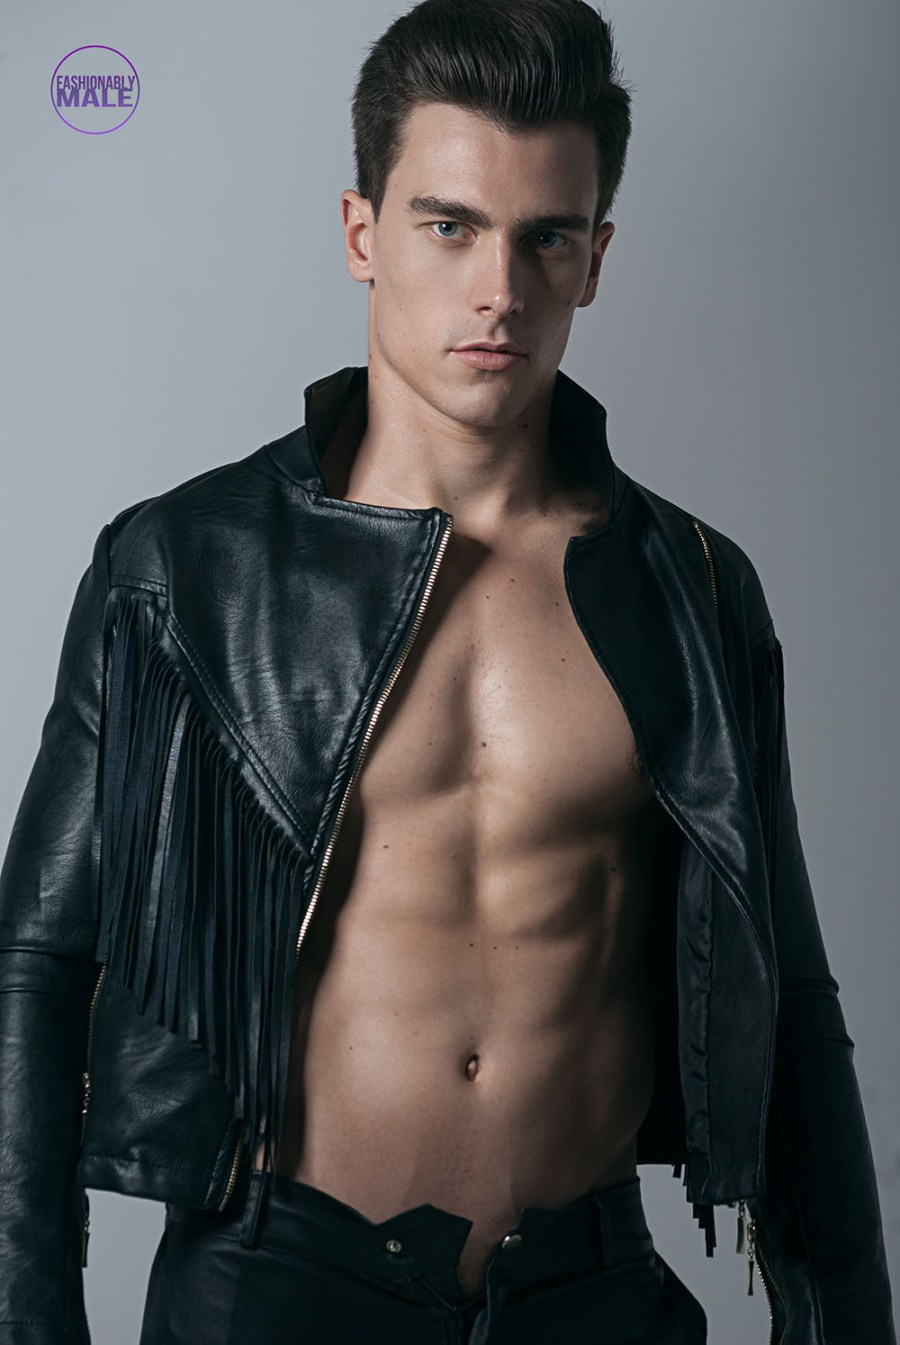 Tomas by Jo Herrera for Fashionably Male2